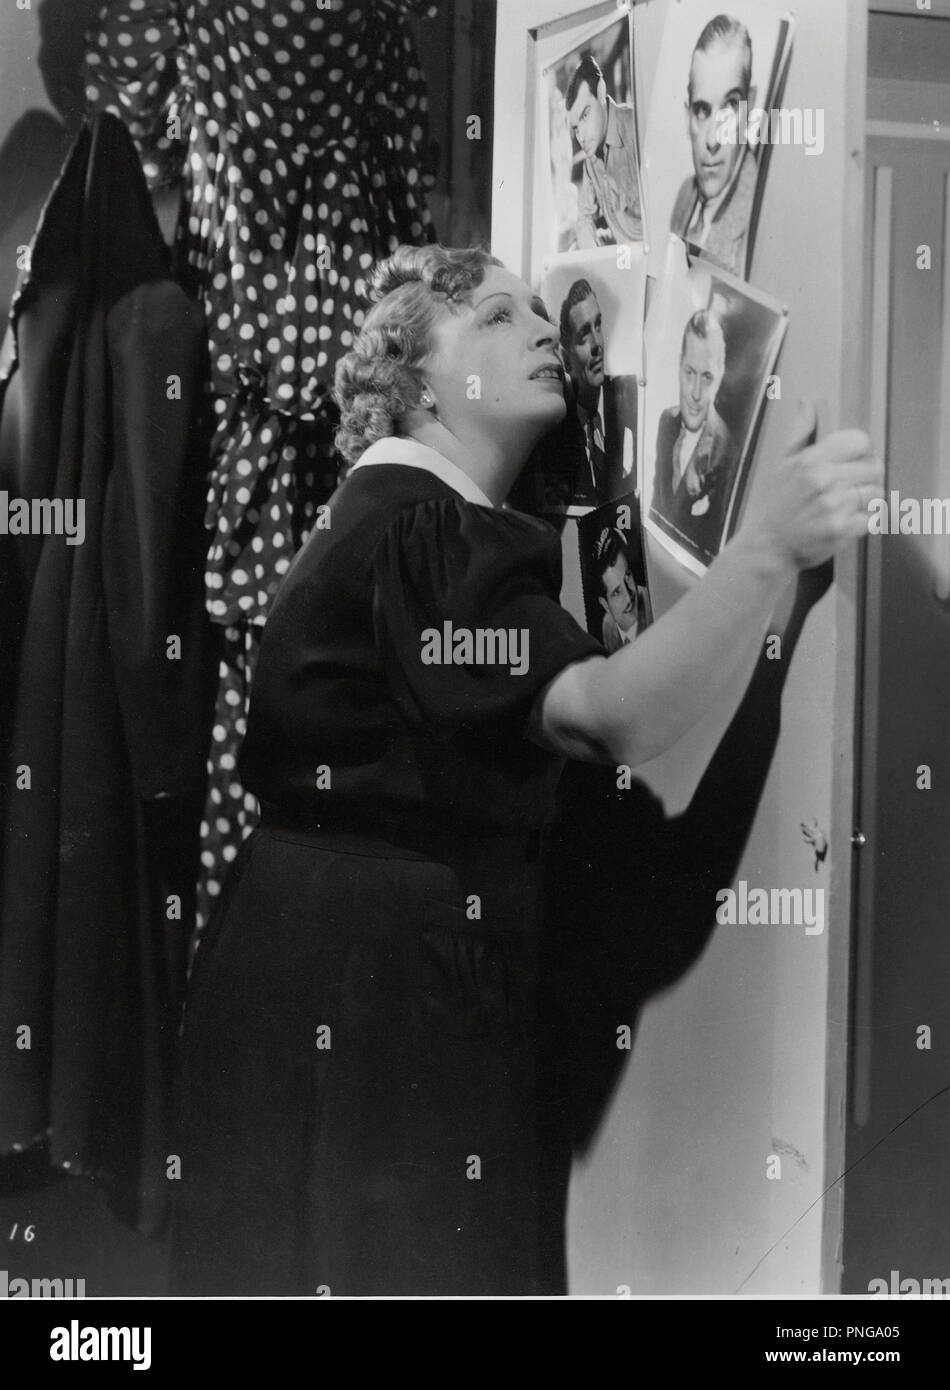 Original film title: LOS APUROS DE CLAUDINA. English title: LOS APUROS DE CLAUDINA. Year: 1940. Director: MIGUEL CORONATTO-PAZ. Stars: OLINDA BOZAN. - Stock Image